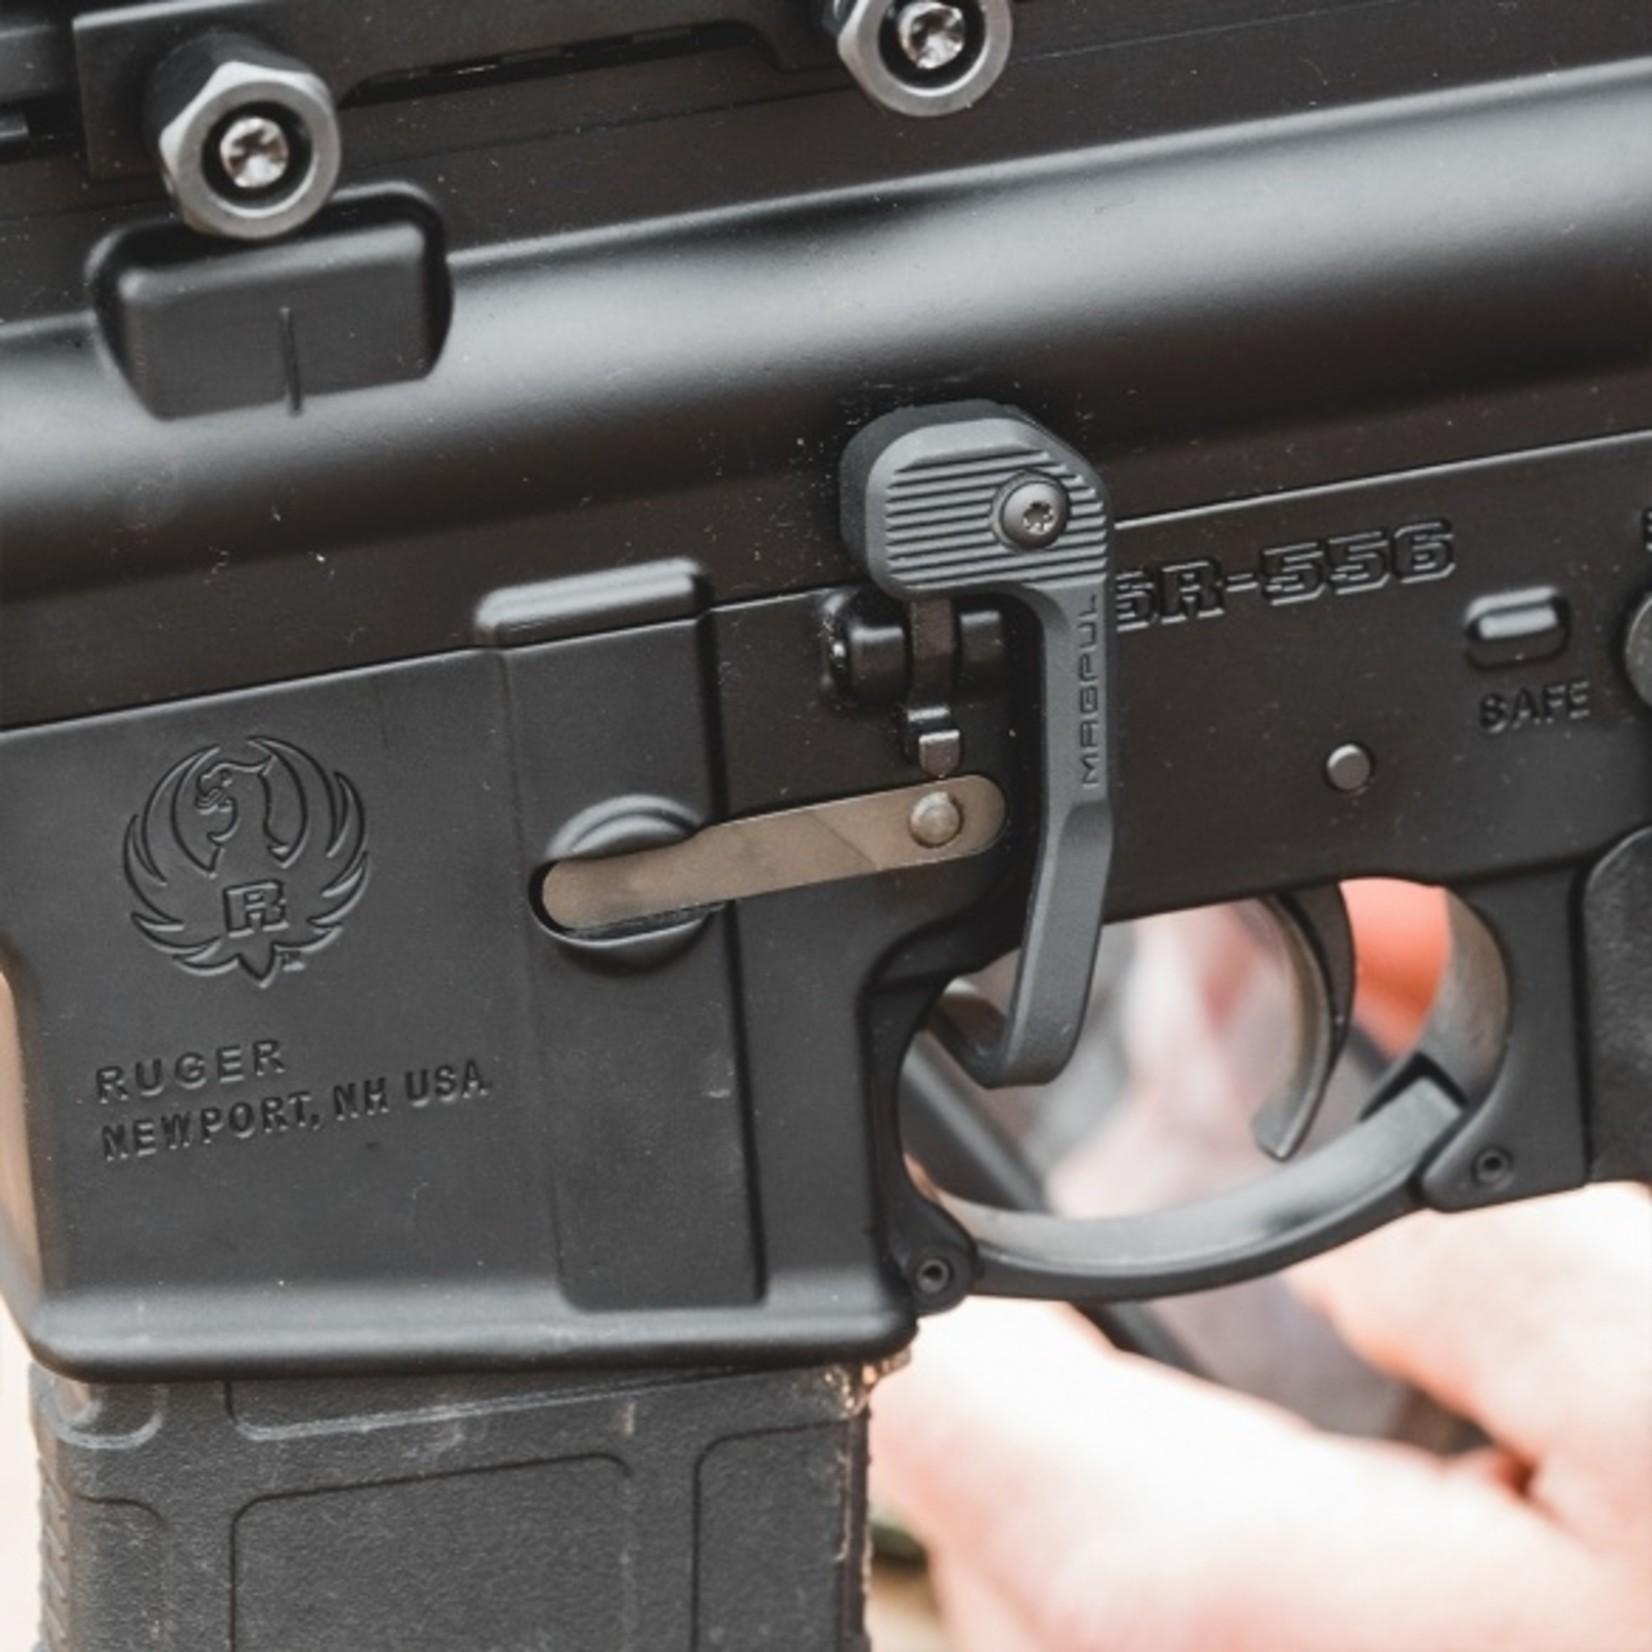 MAGPUL B.A.D. LEVER - Battery Assist Device – AR15/M16